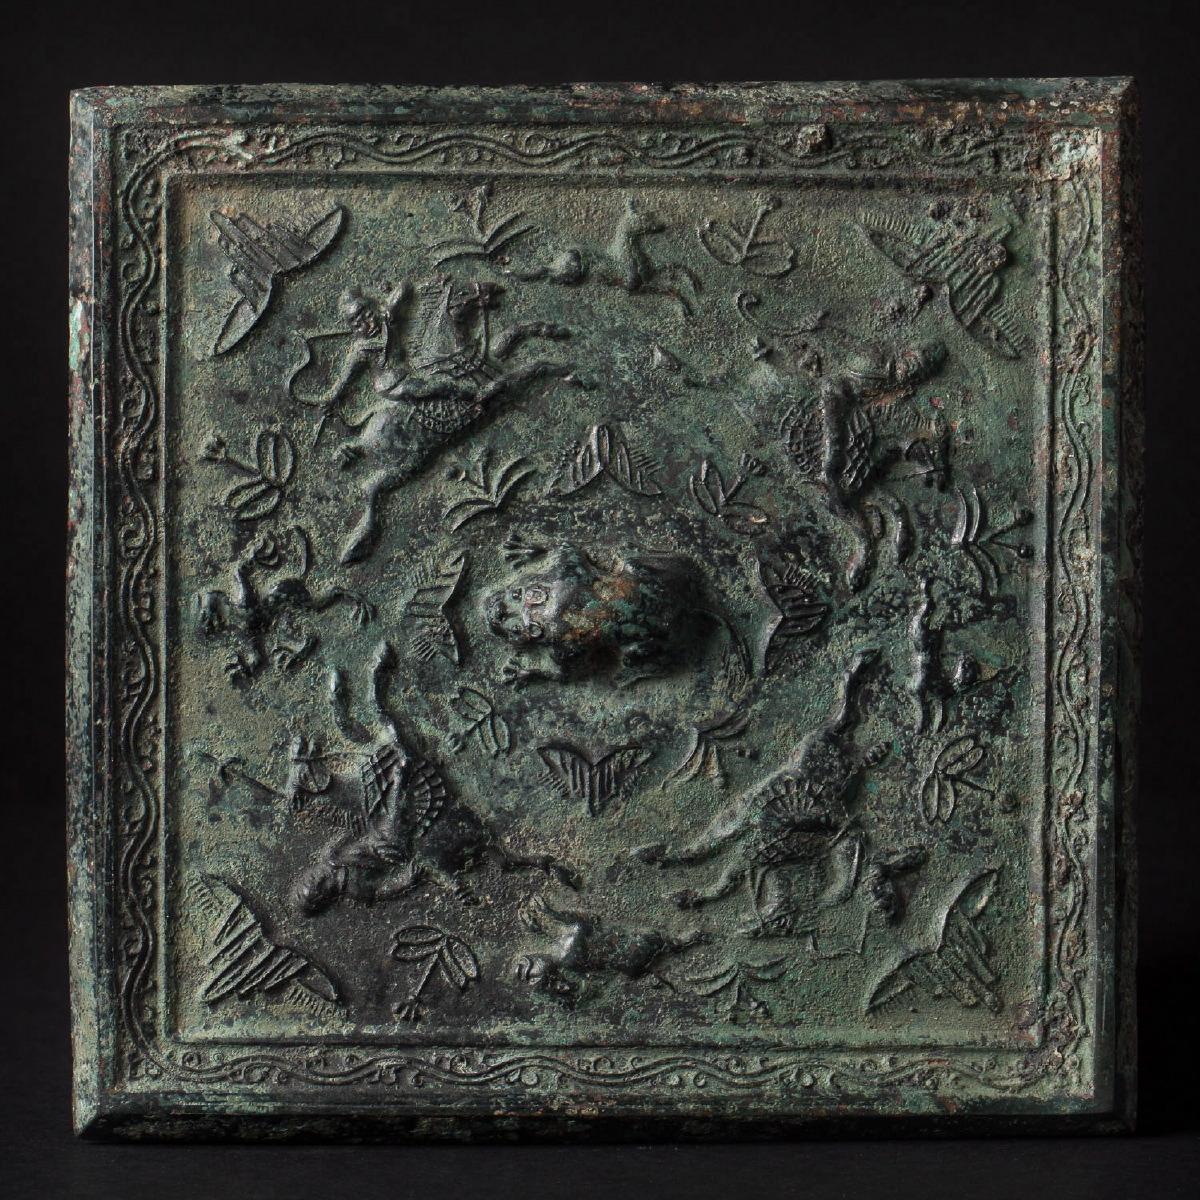 Photo of ancient-chinese-art-saint-paul-de-vence-bronze-mirror-tang-galerie-golconda-china